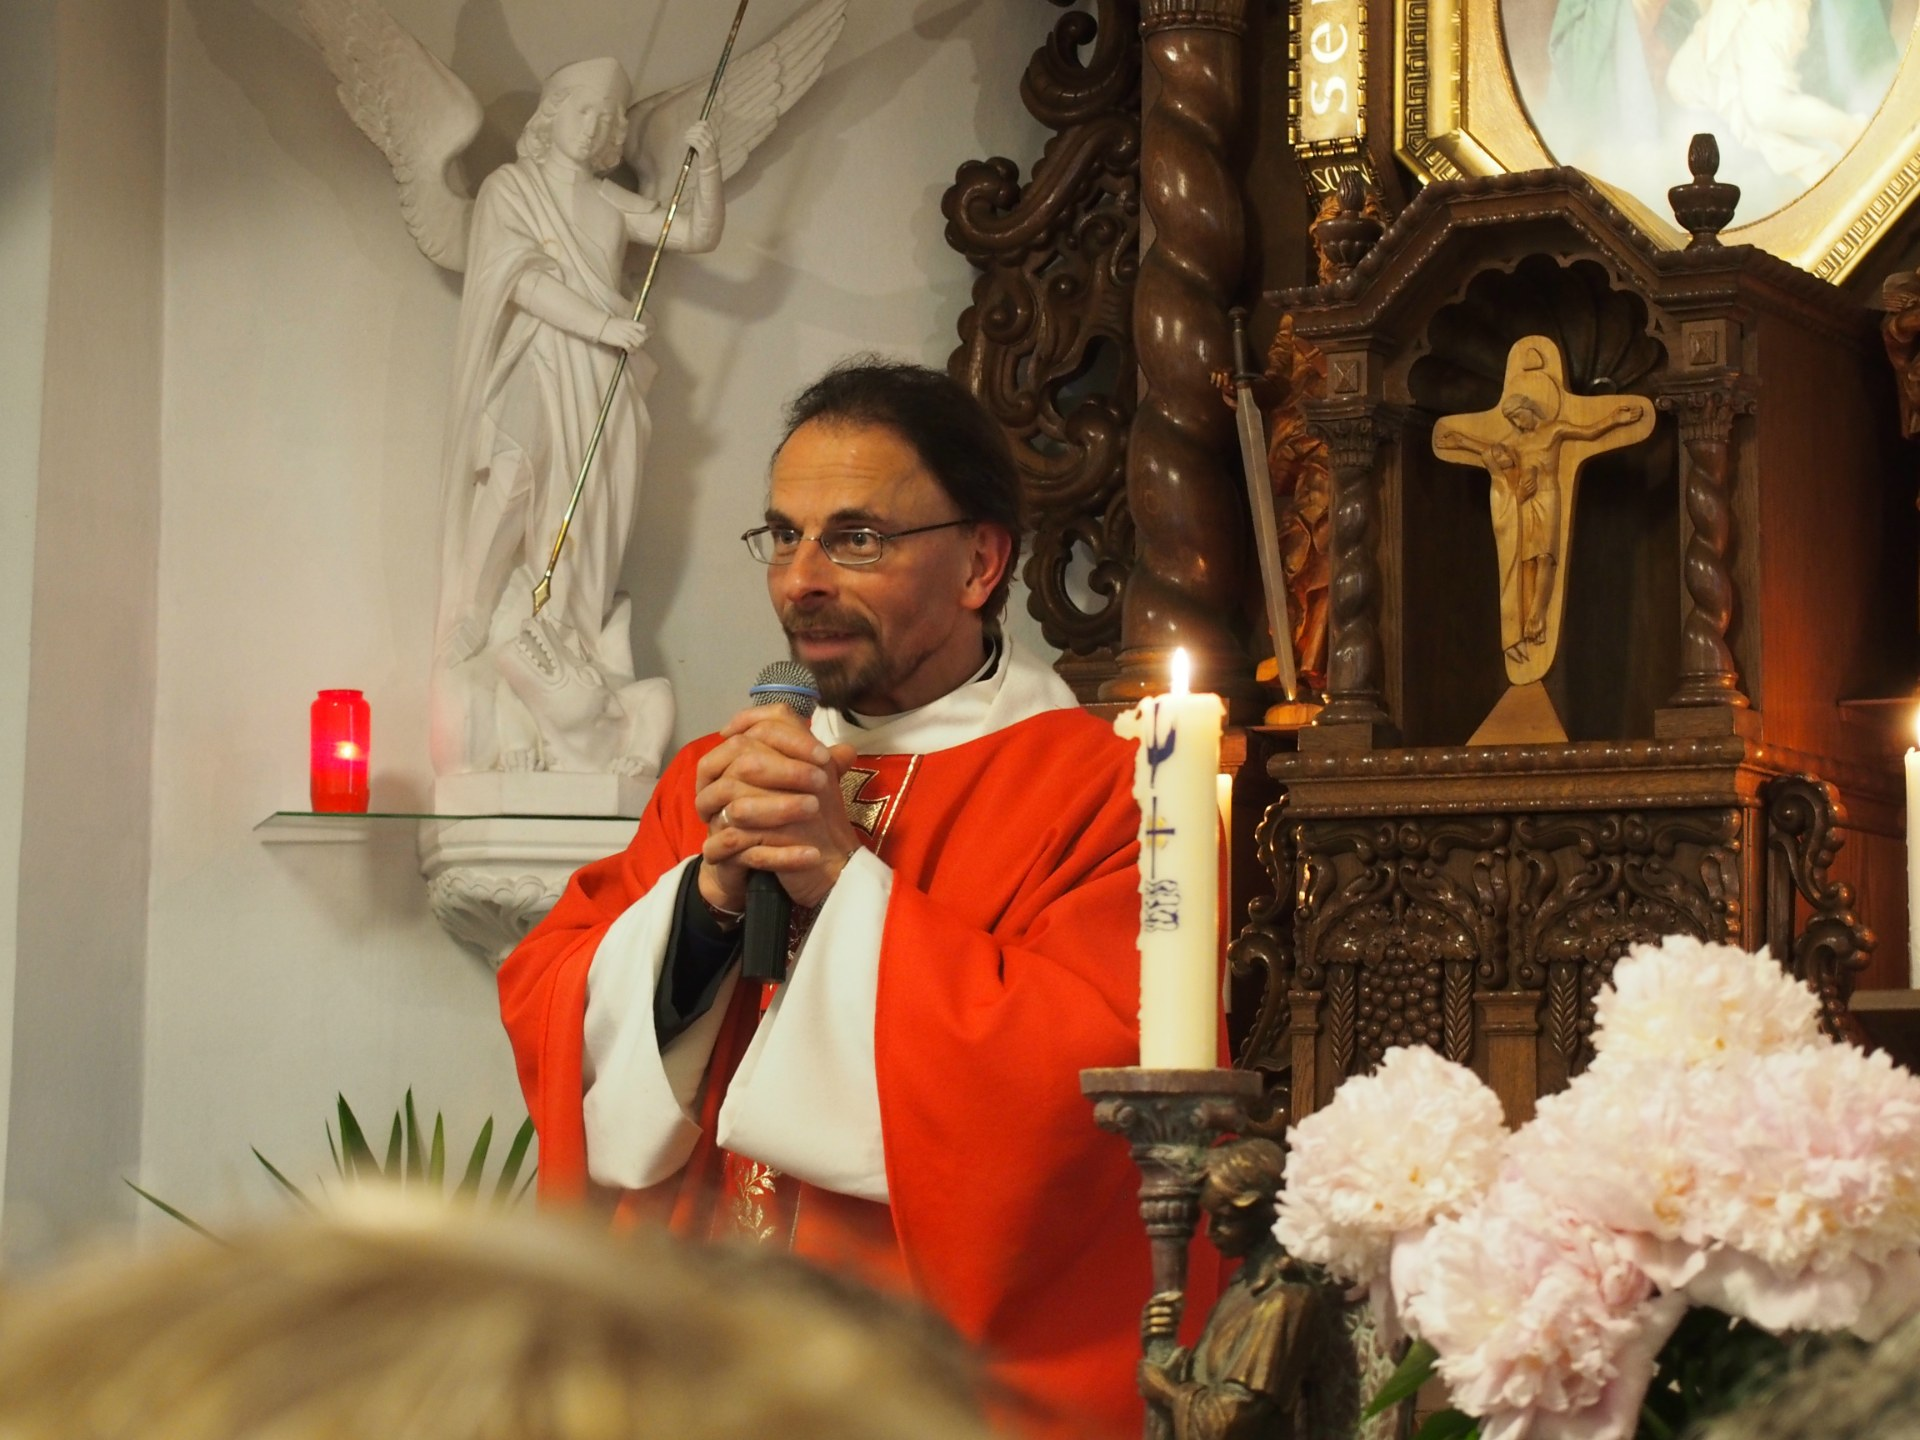 Père Jean-Marie Moura